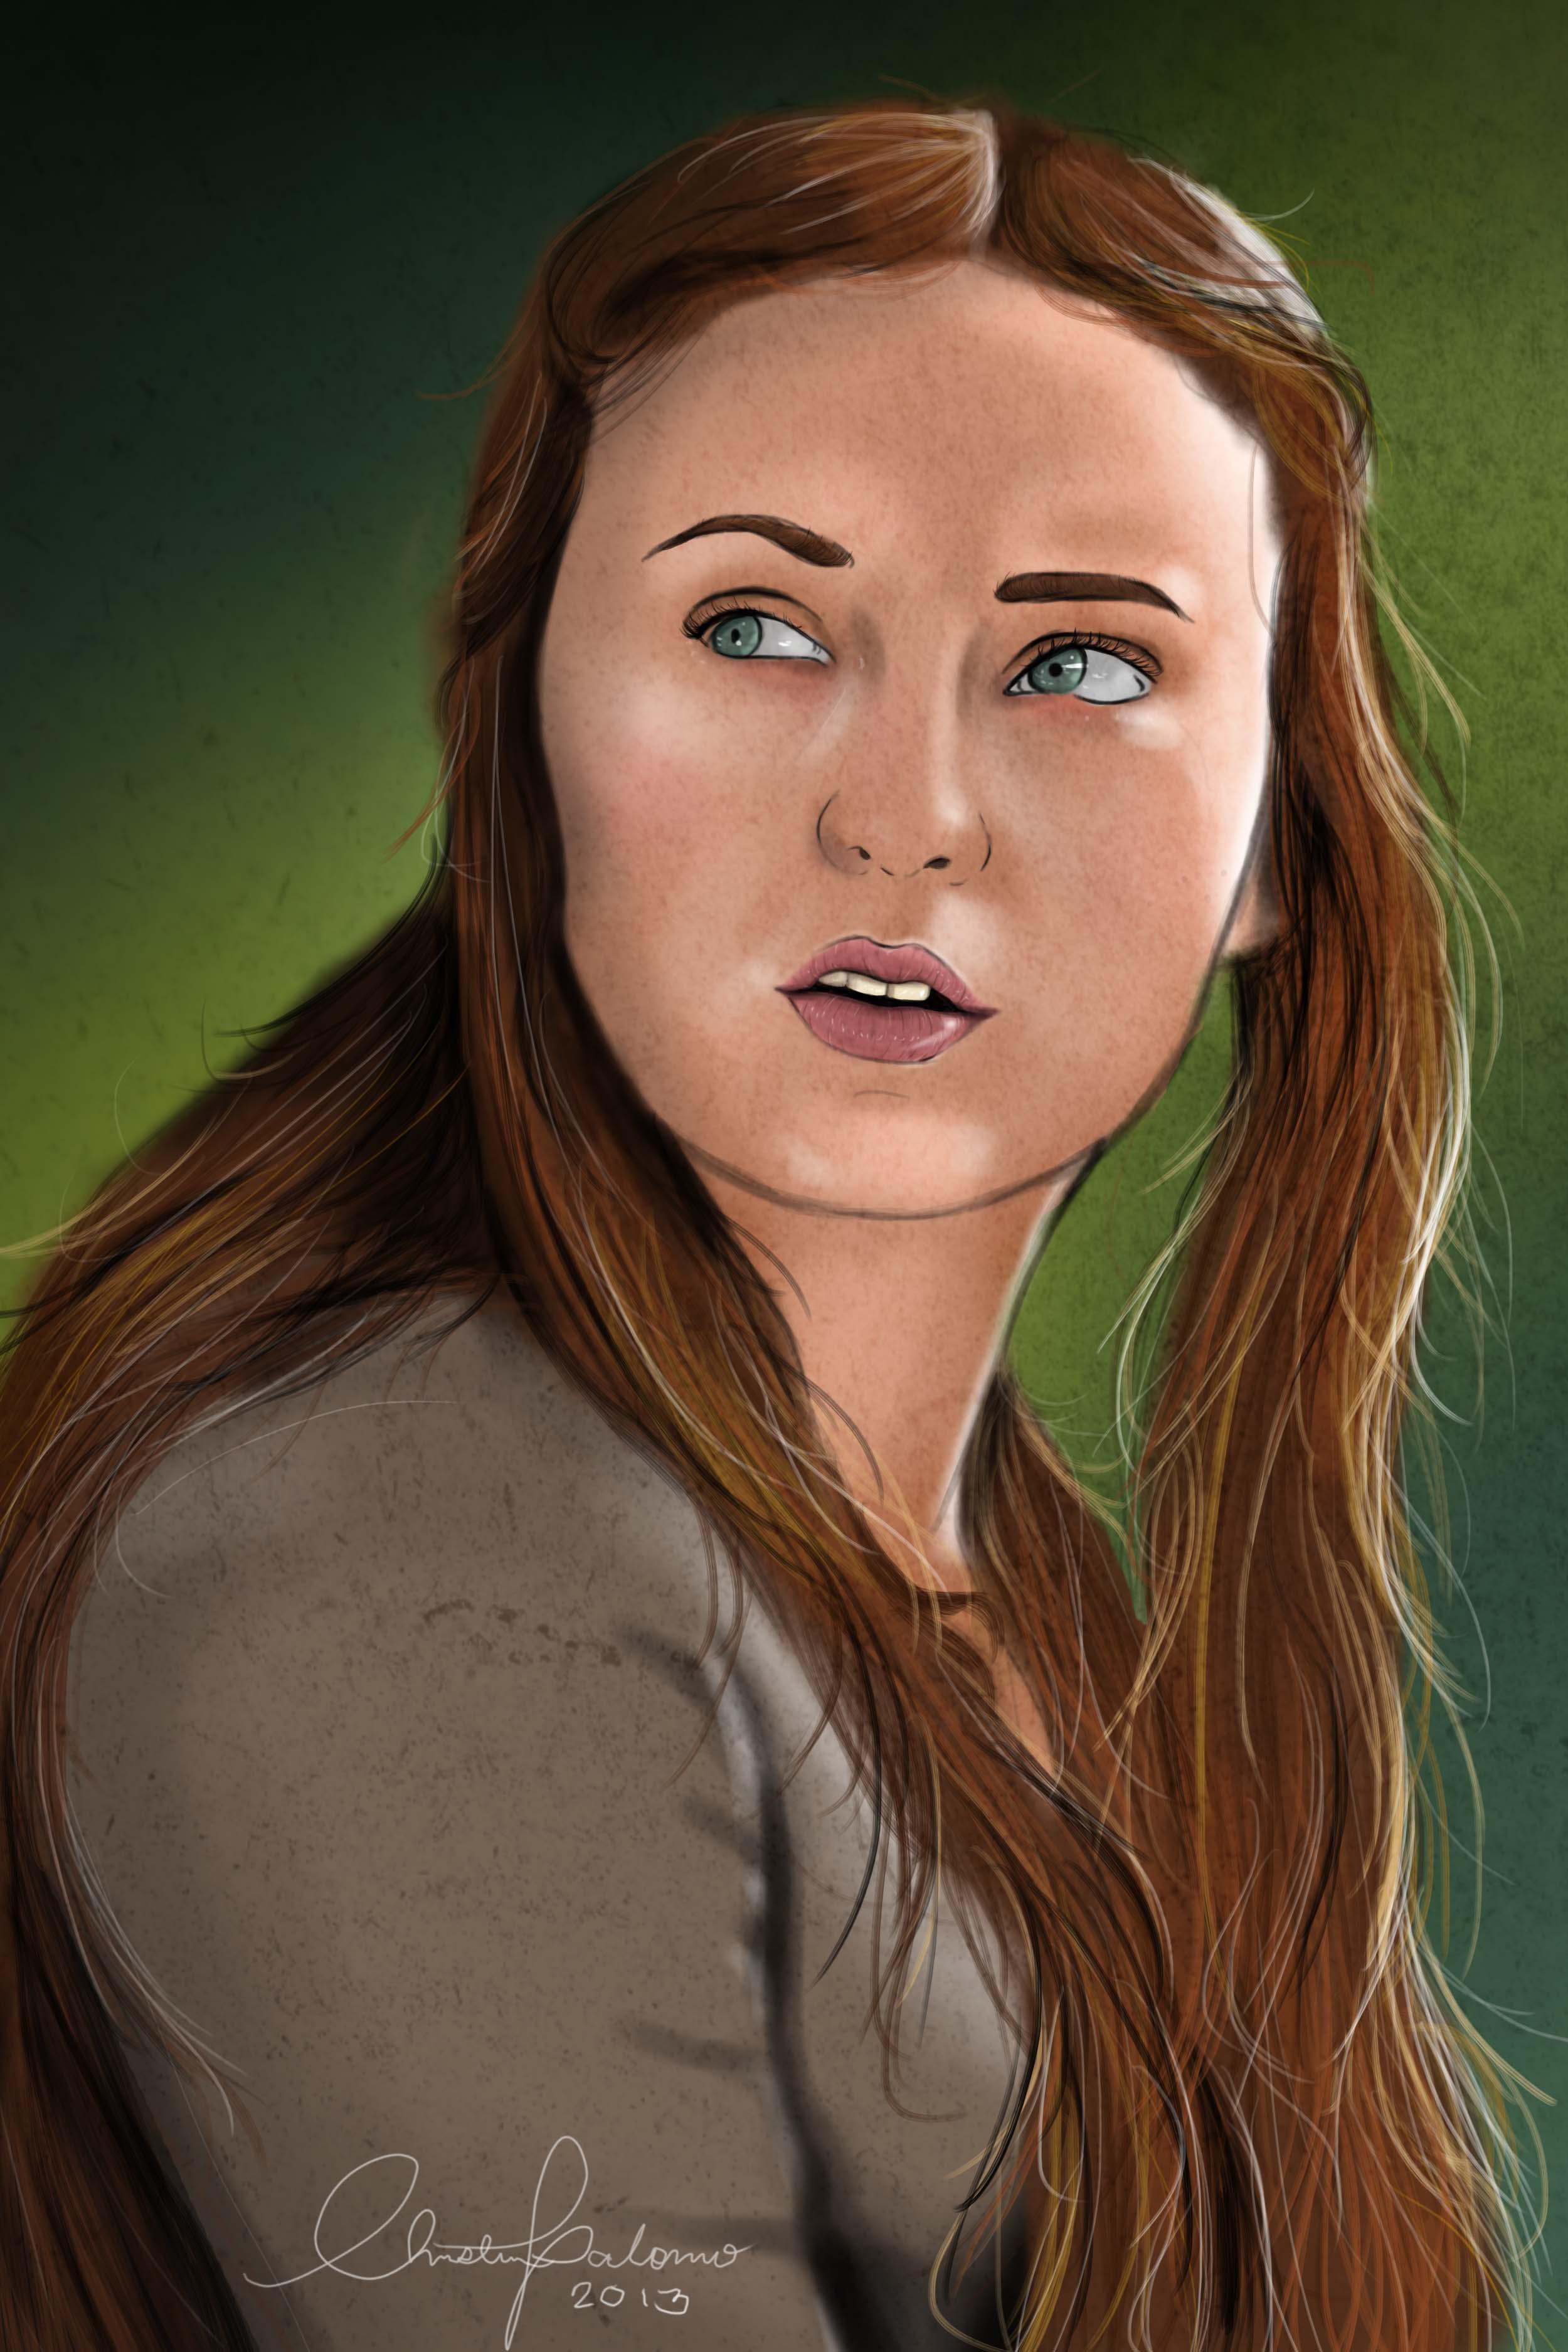 Game Of Thrones Sansa Stark Portraits Wallpaper | Apps Directories